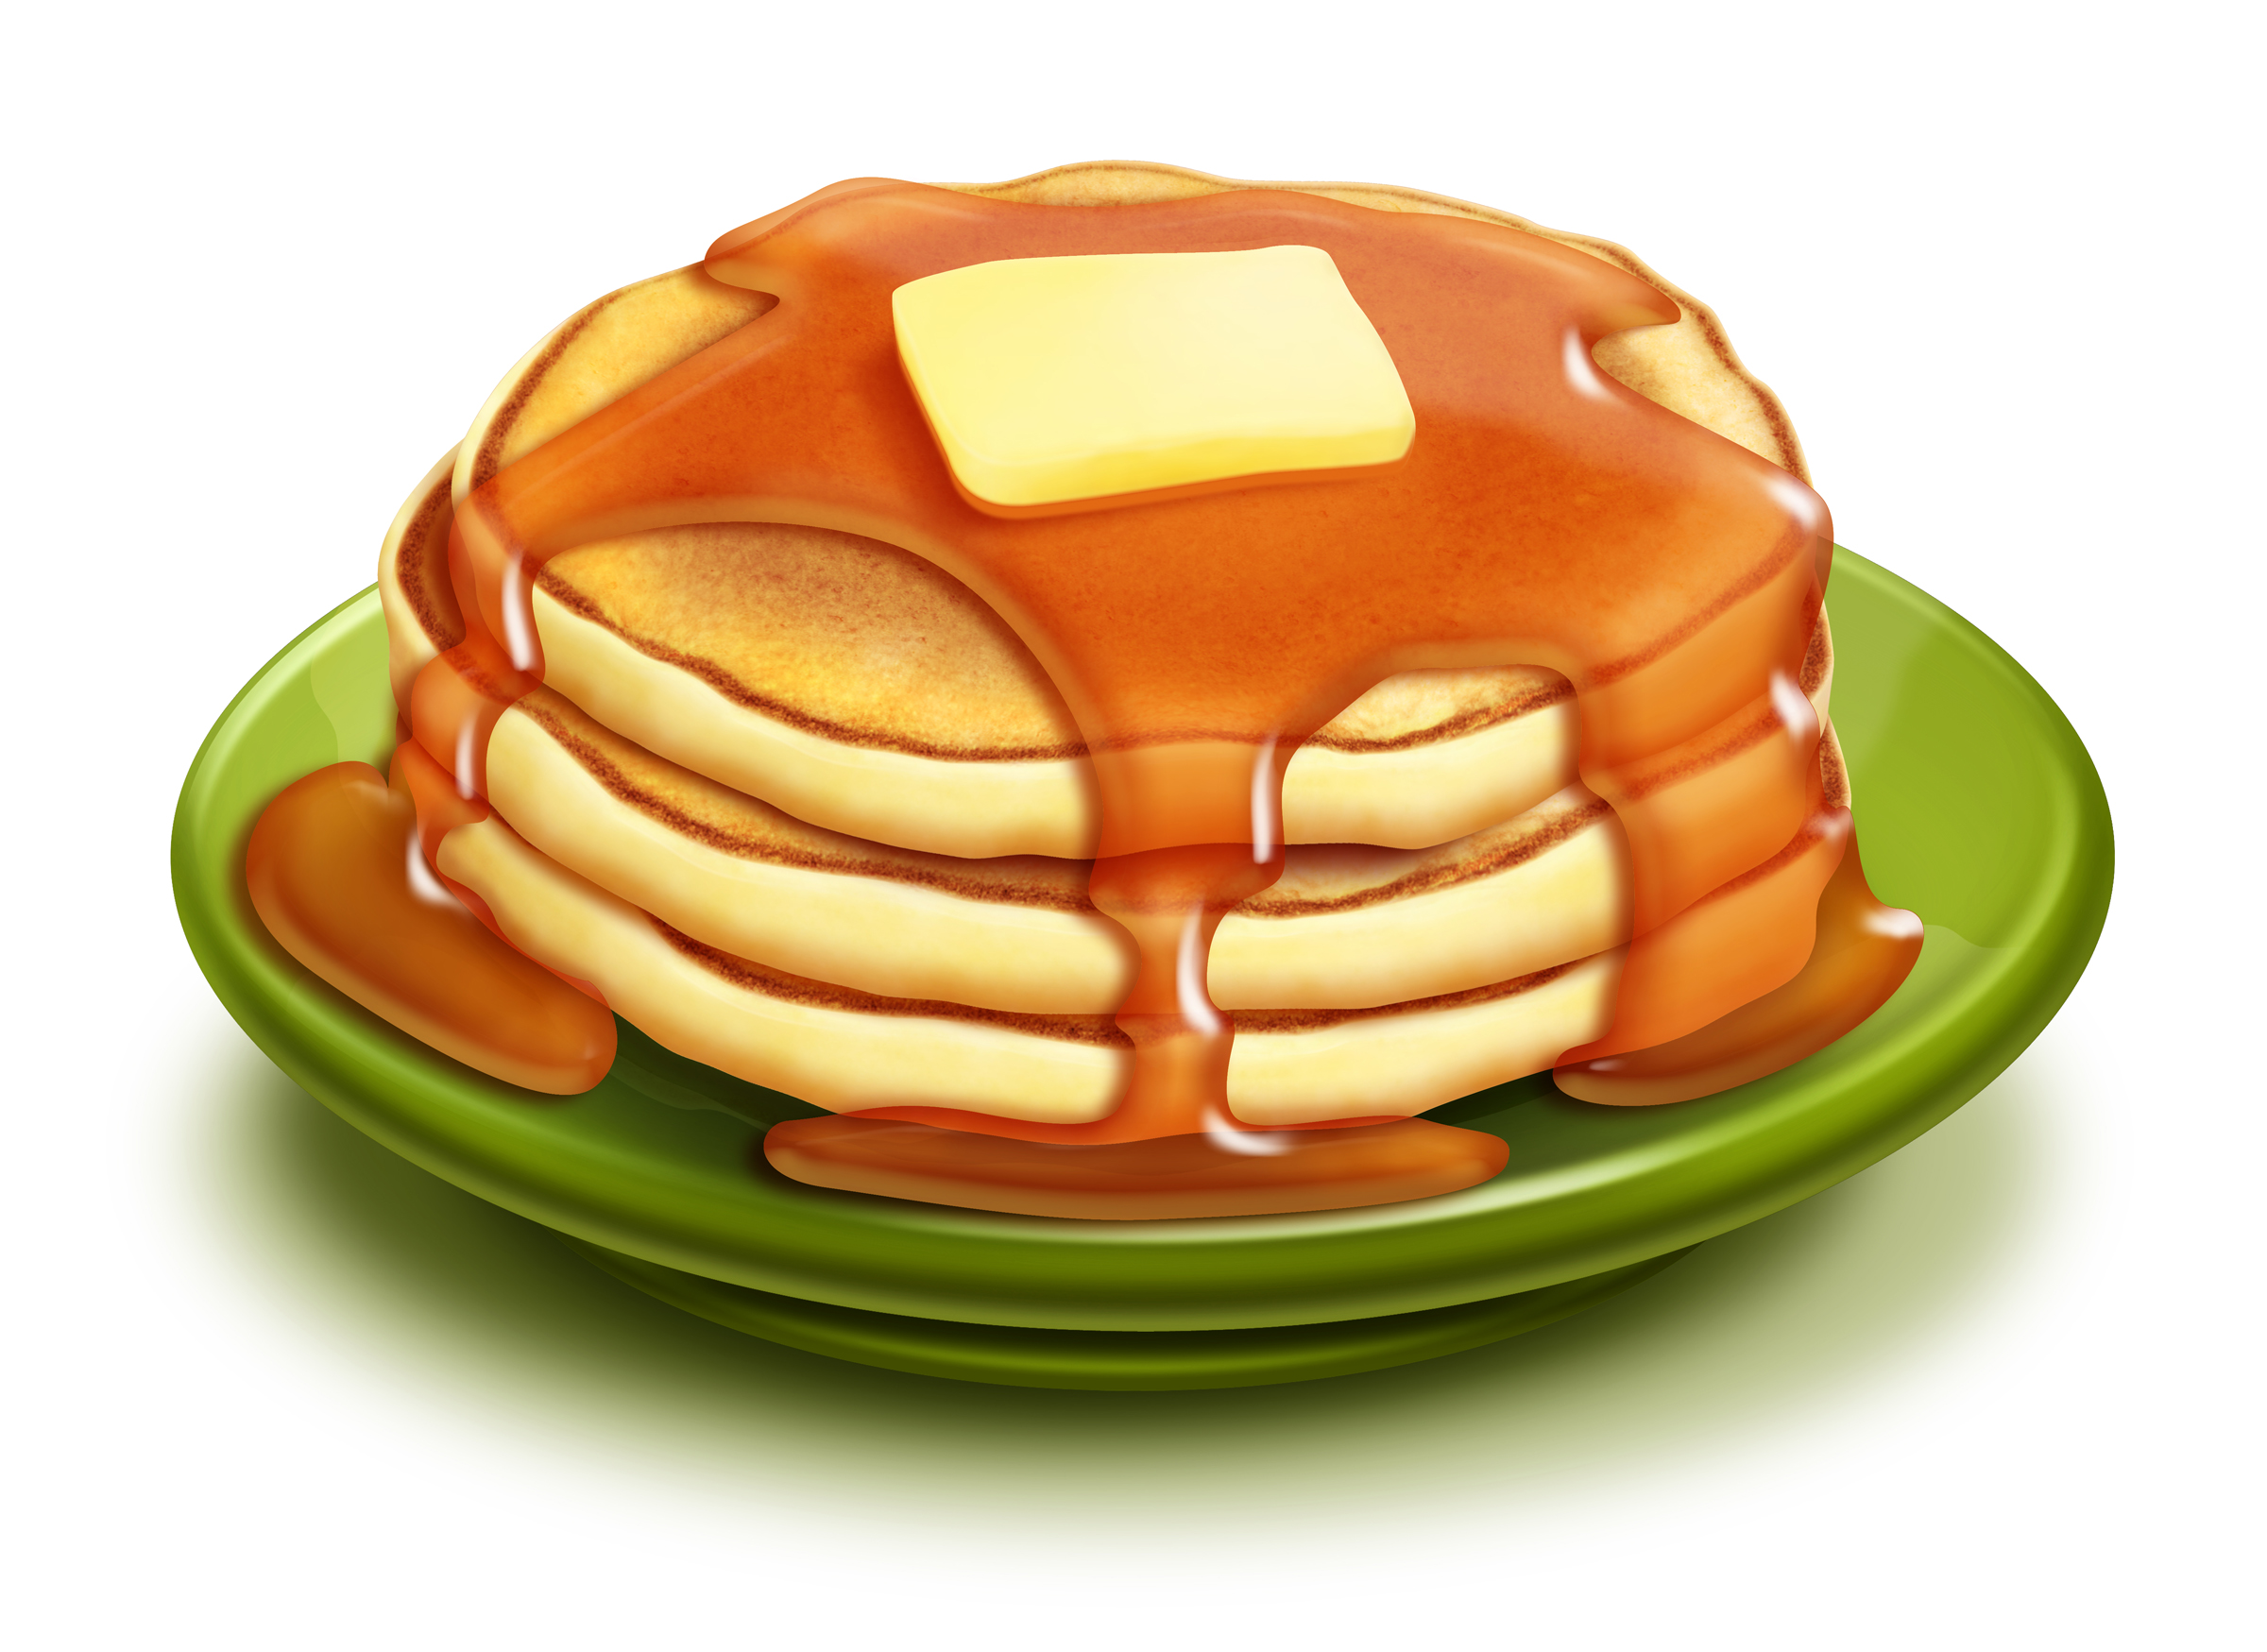 Pancake Breakfast Clip Art N17 free image.